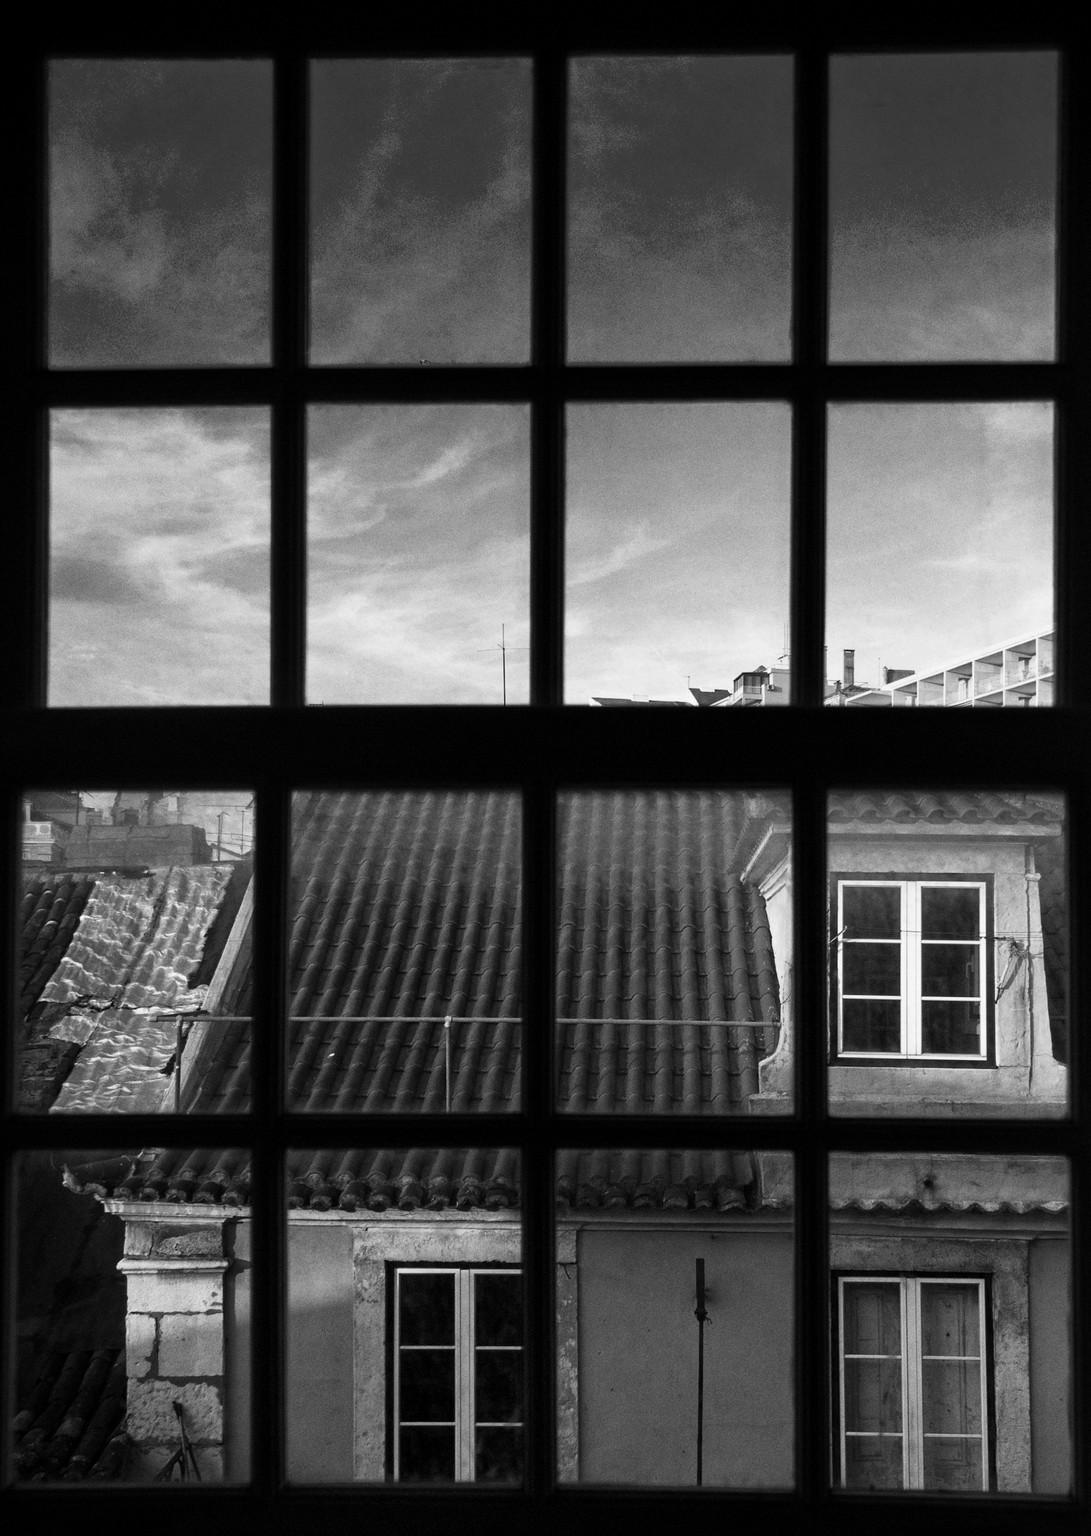 Flavia_Fiengo_Windows00030